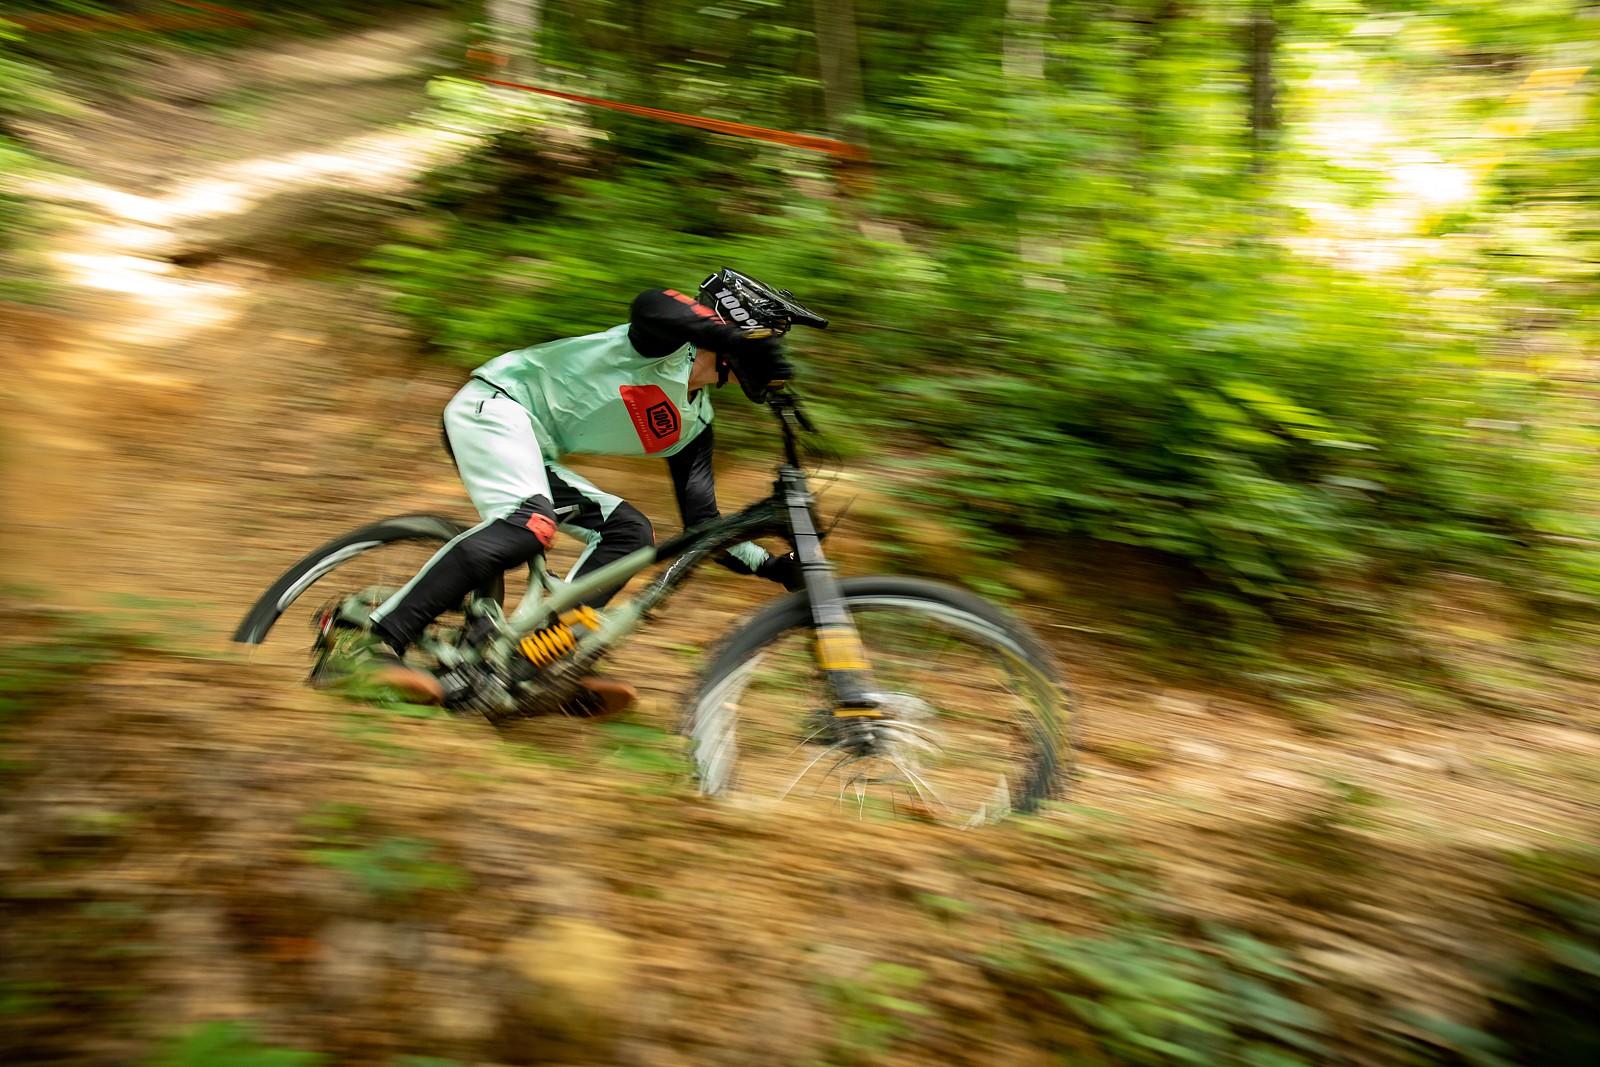 13 - JackRice - Mountain Biking Pictures - Vital MTB